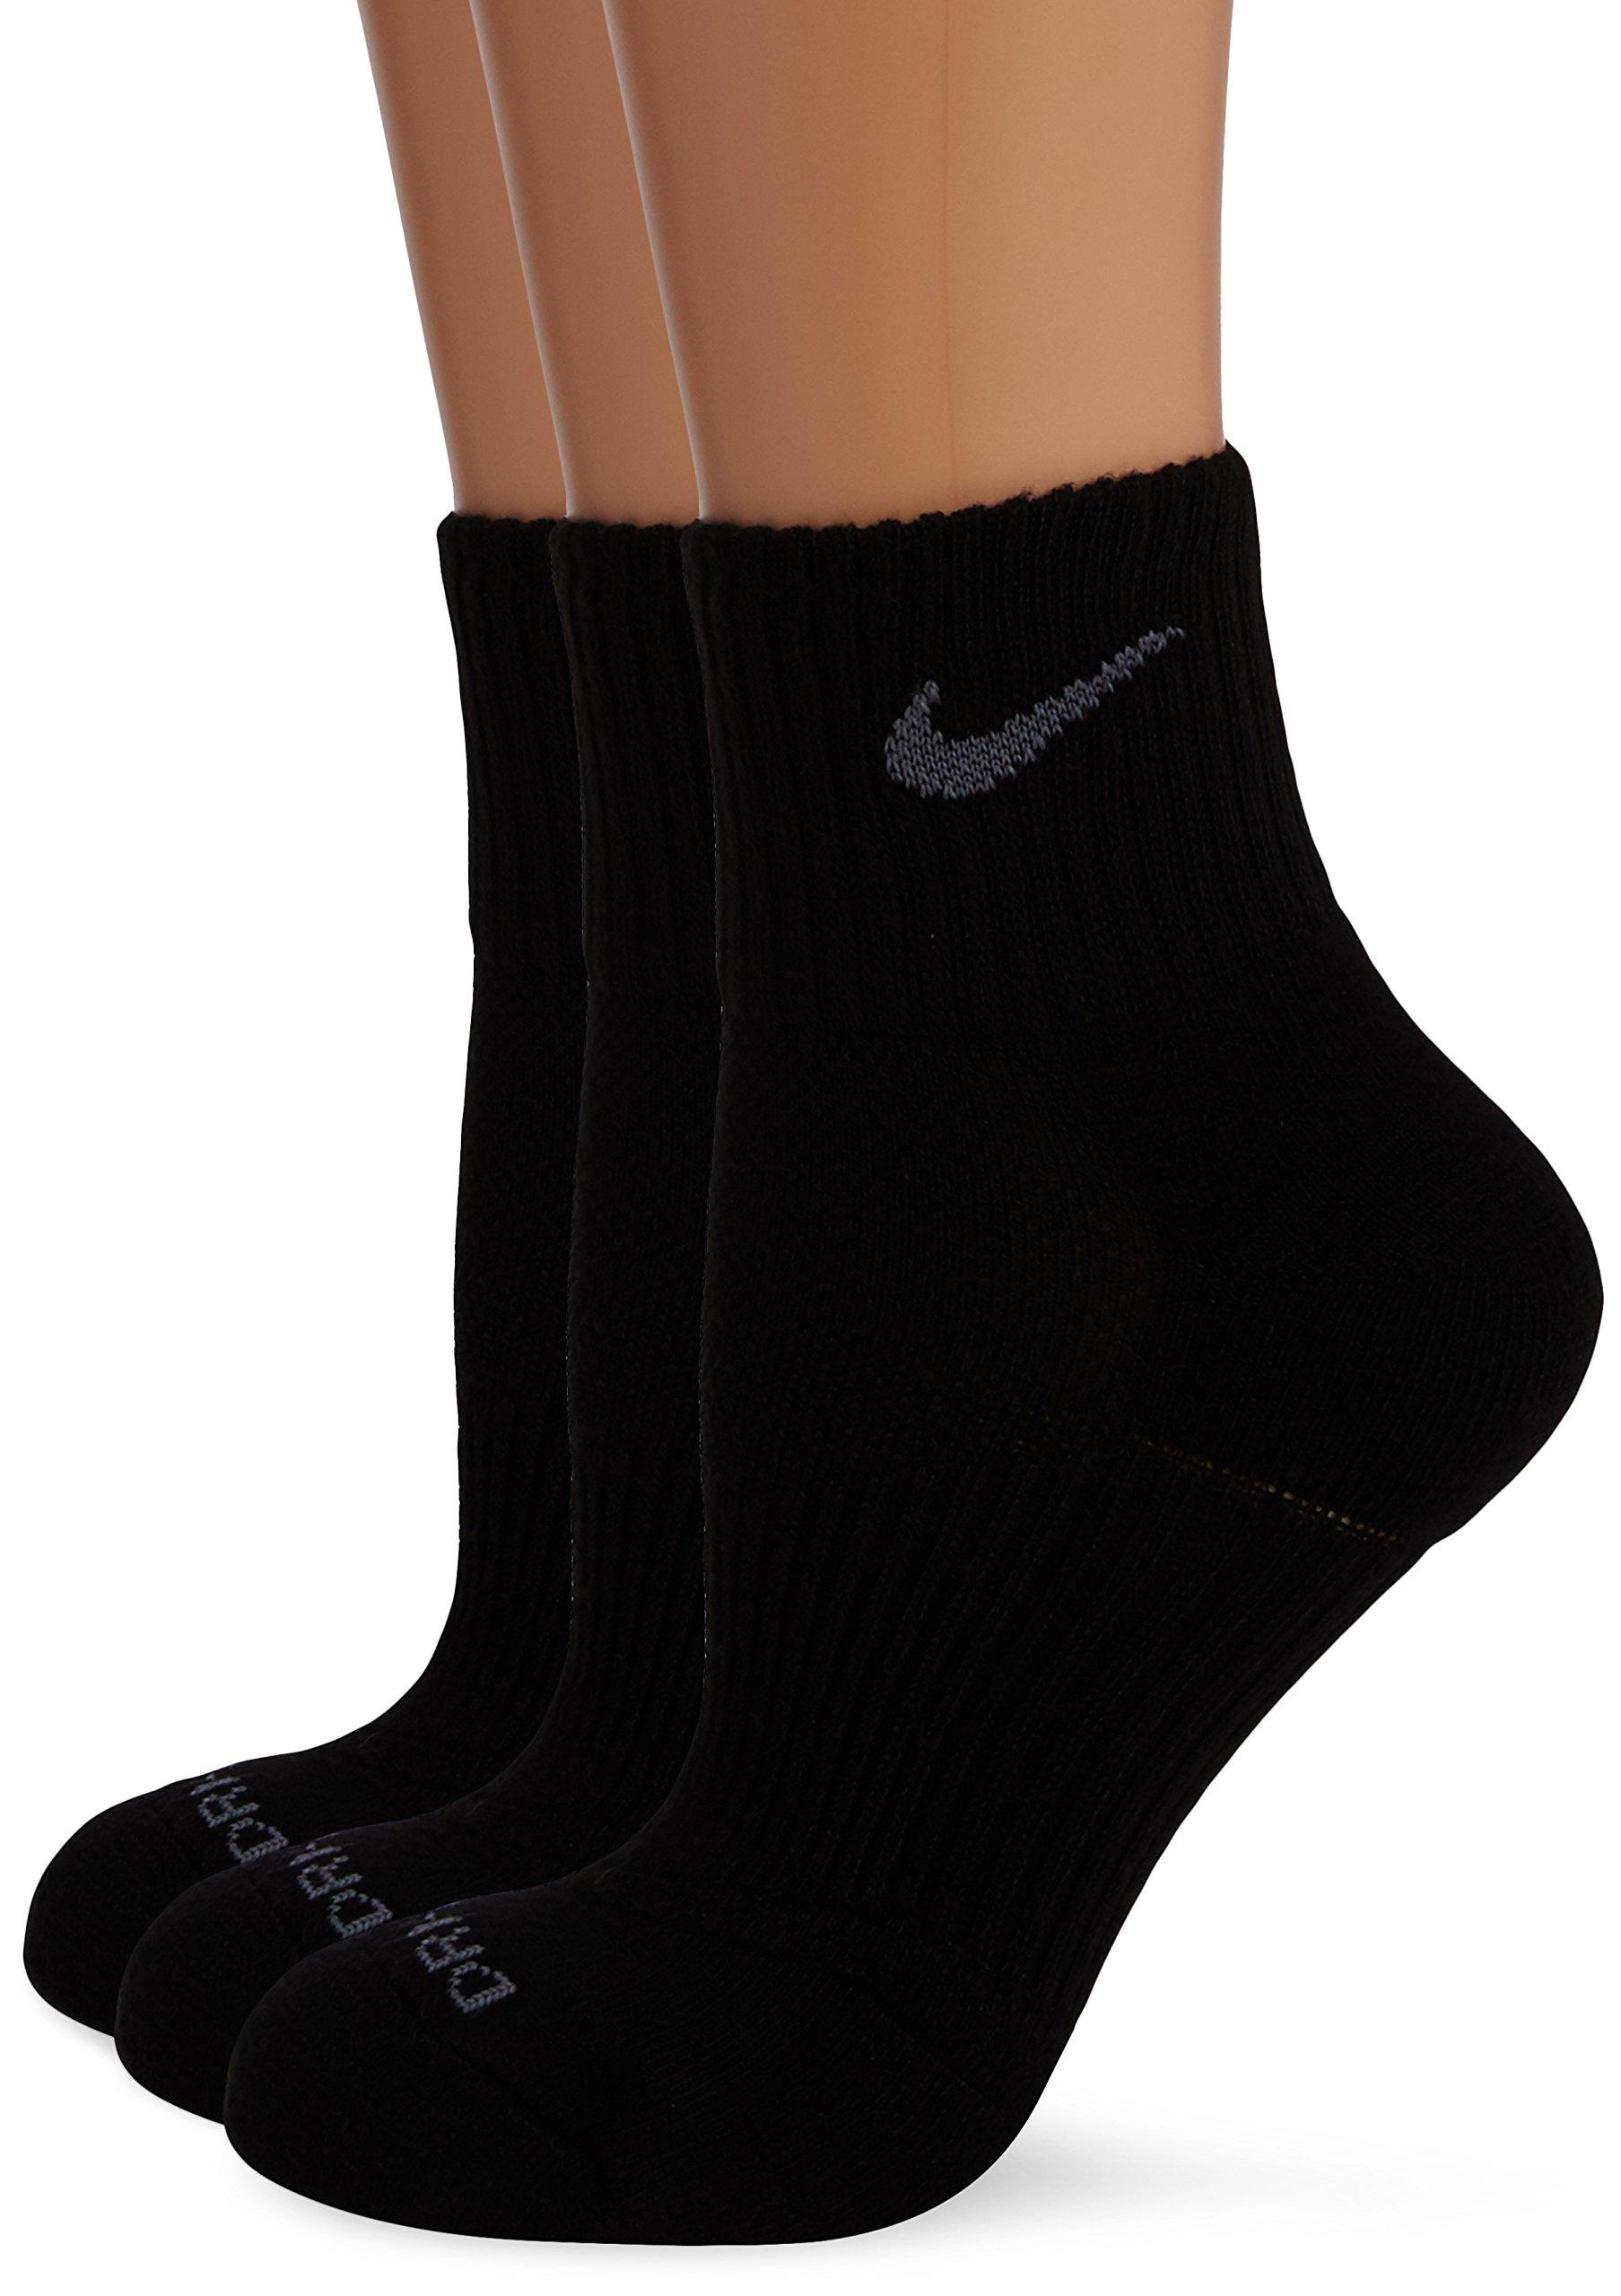 Nike Dri-Fit Half Cushion Quarter Socks (3 Pack) Black SX4835-001 Size Medium (6-8)